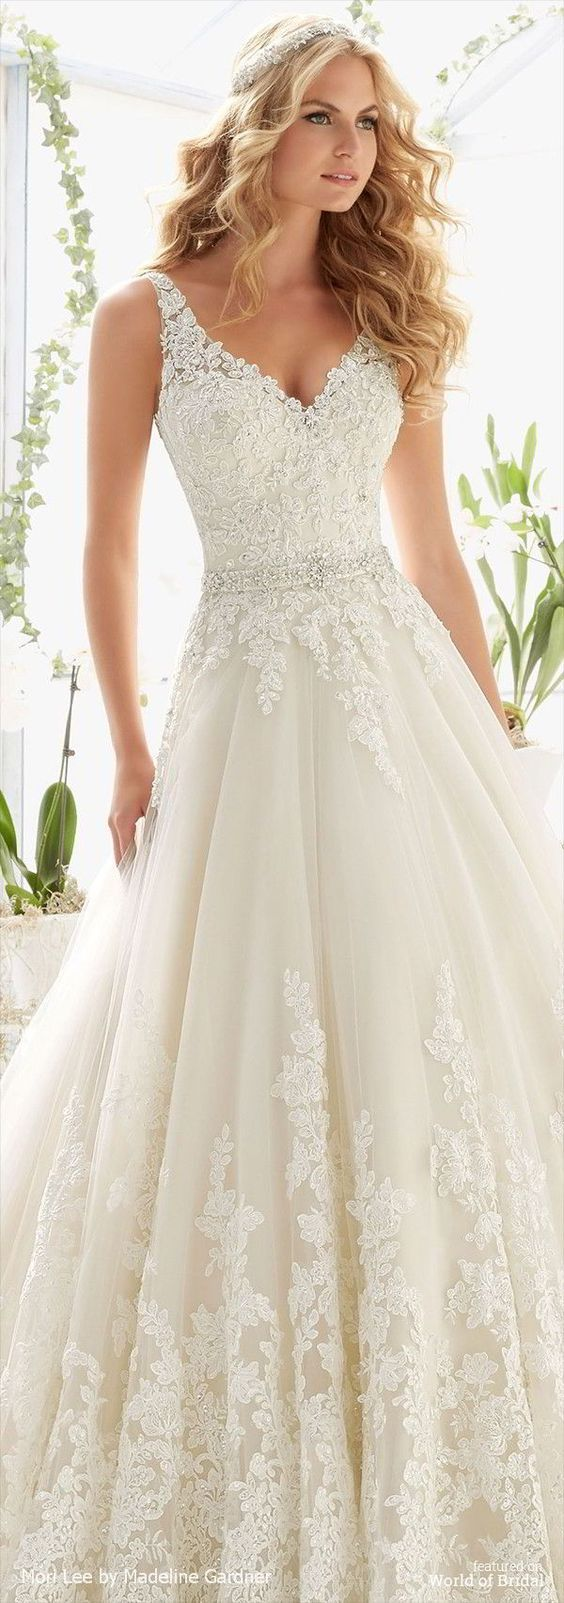 Mori Lee by Madeline Gardner Spring 2016 Wedding Dresses